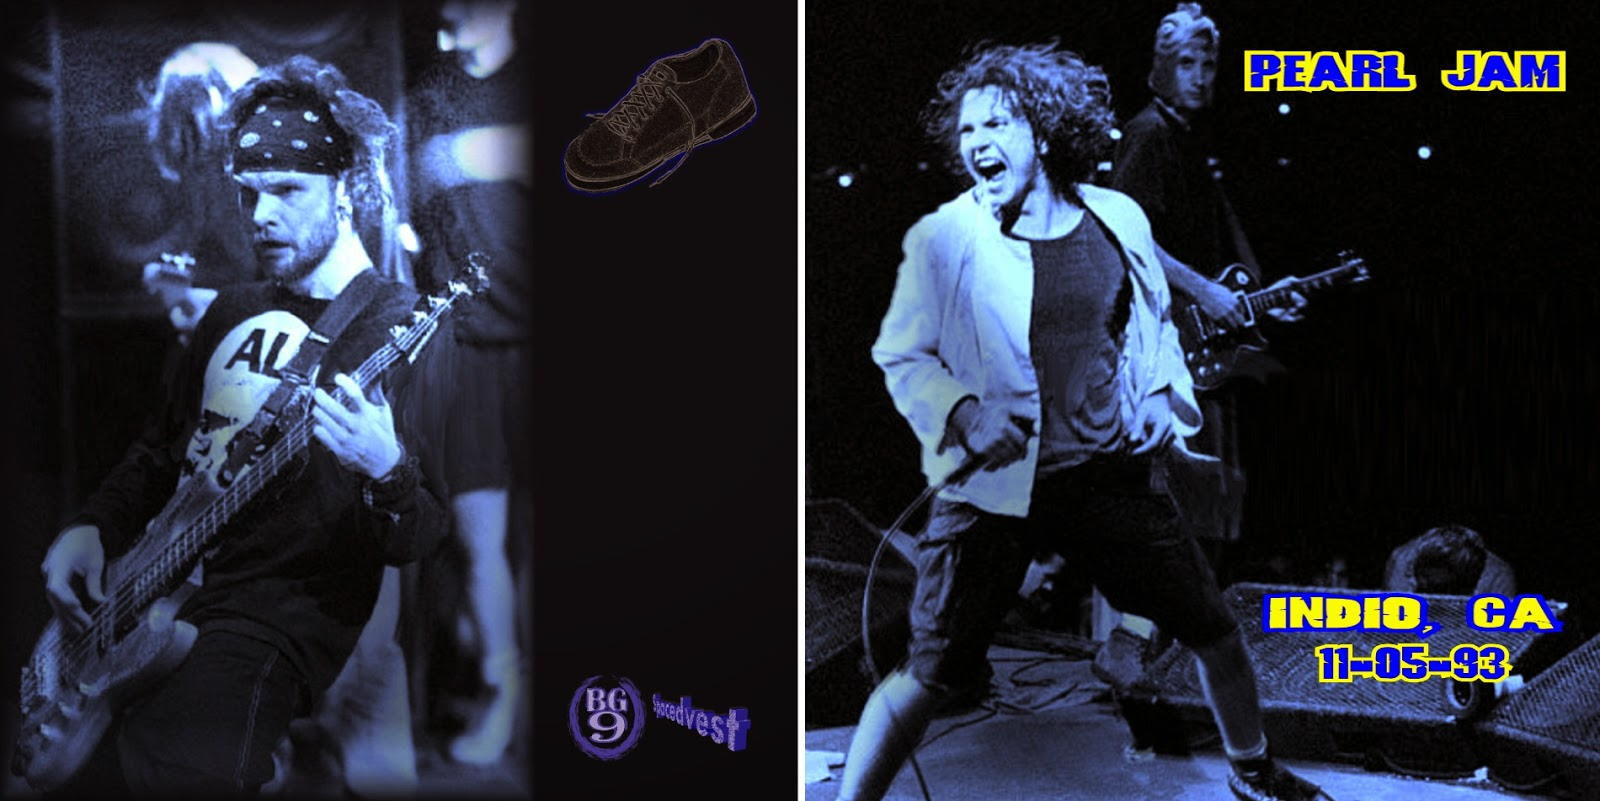 Flac Pearl Jam